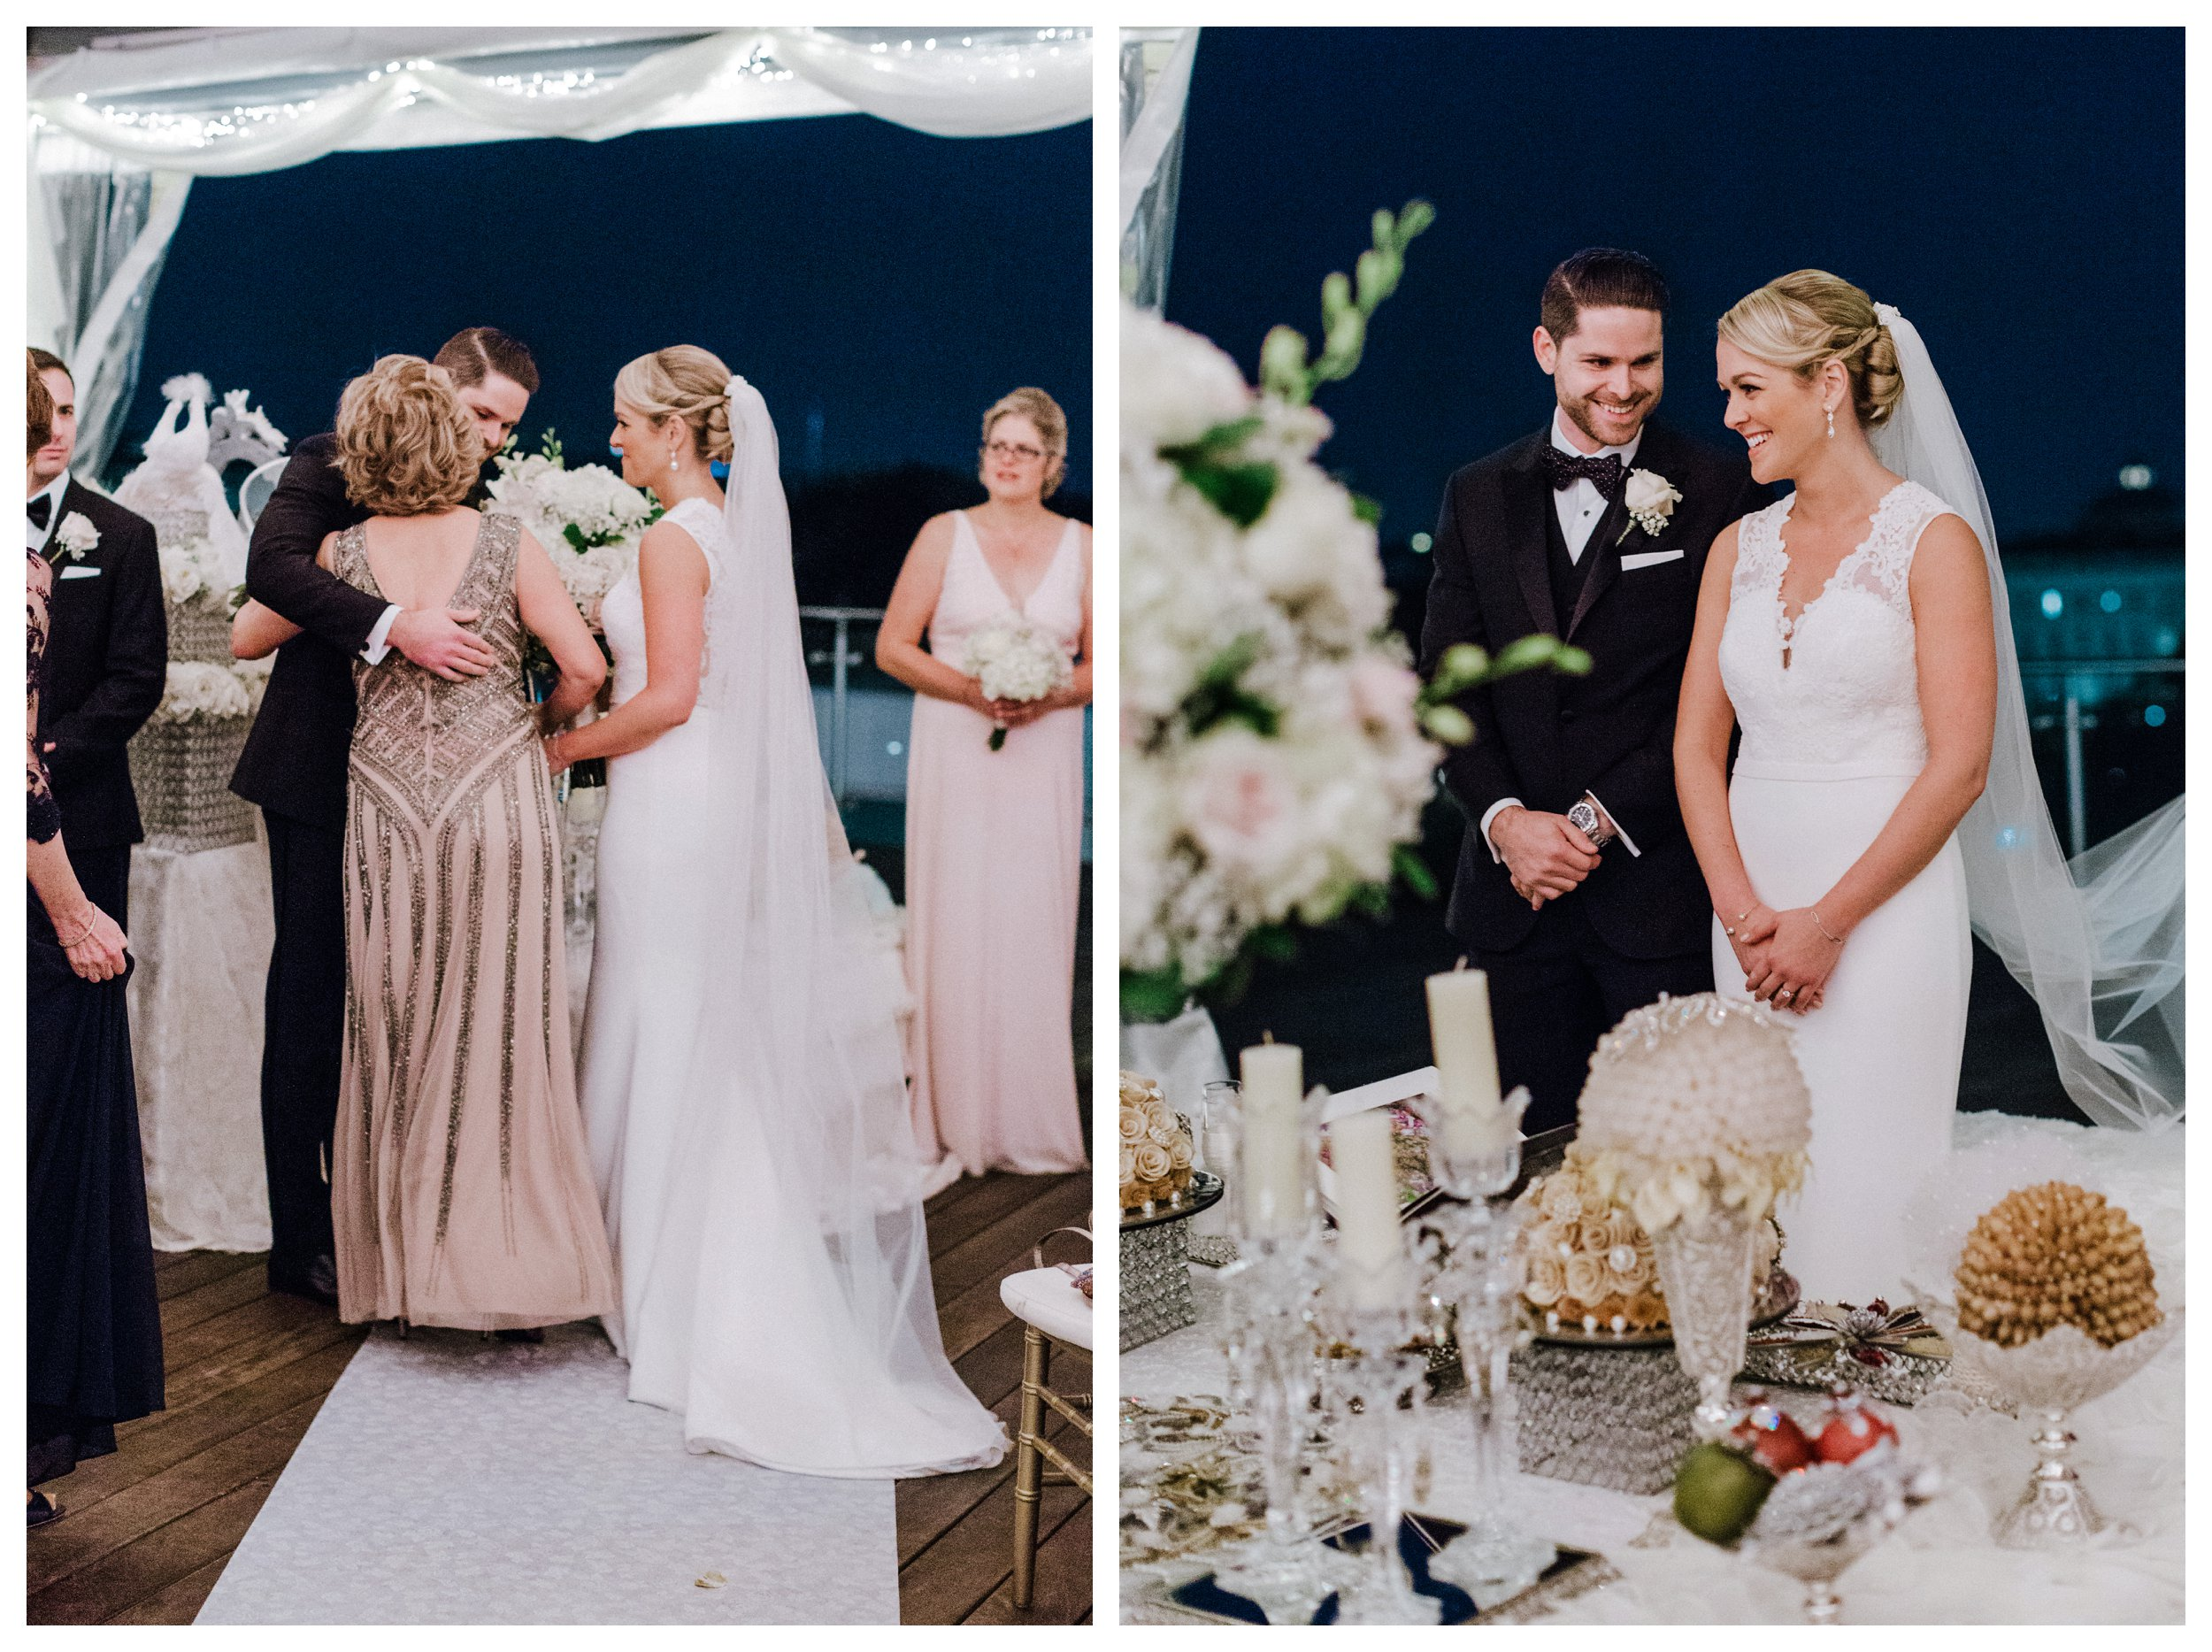 washington-dc-wedding-photographer-36.JPG